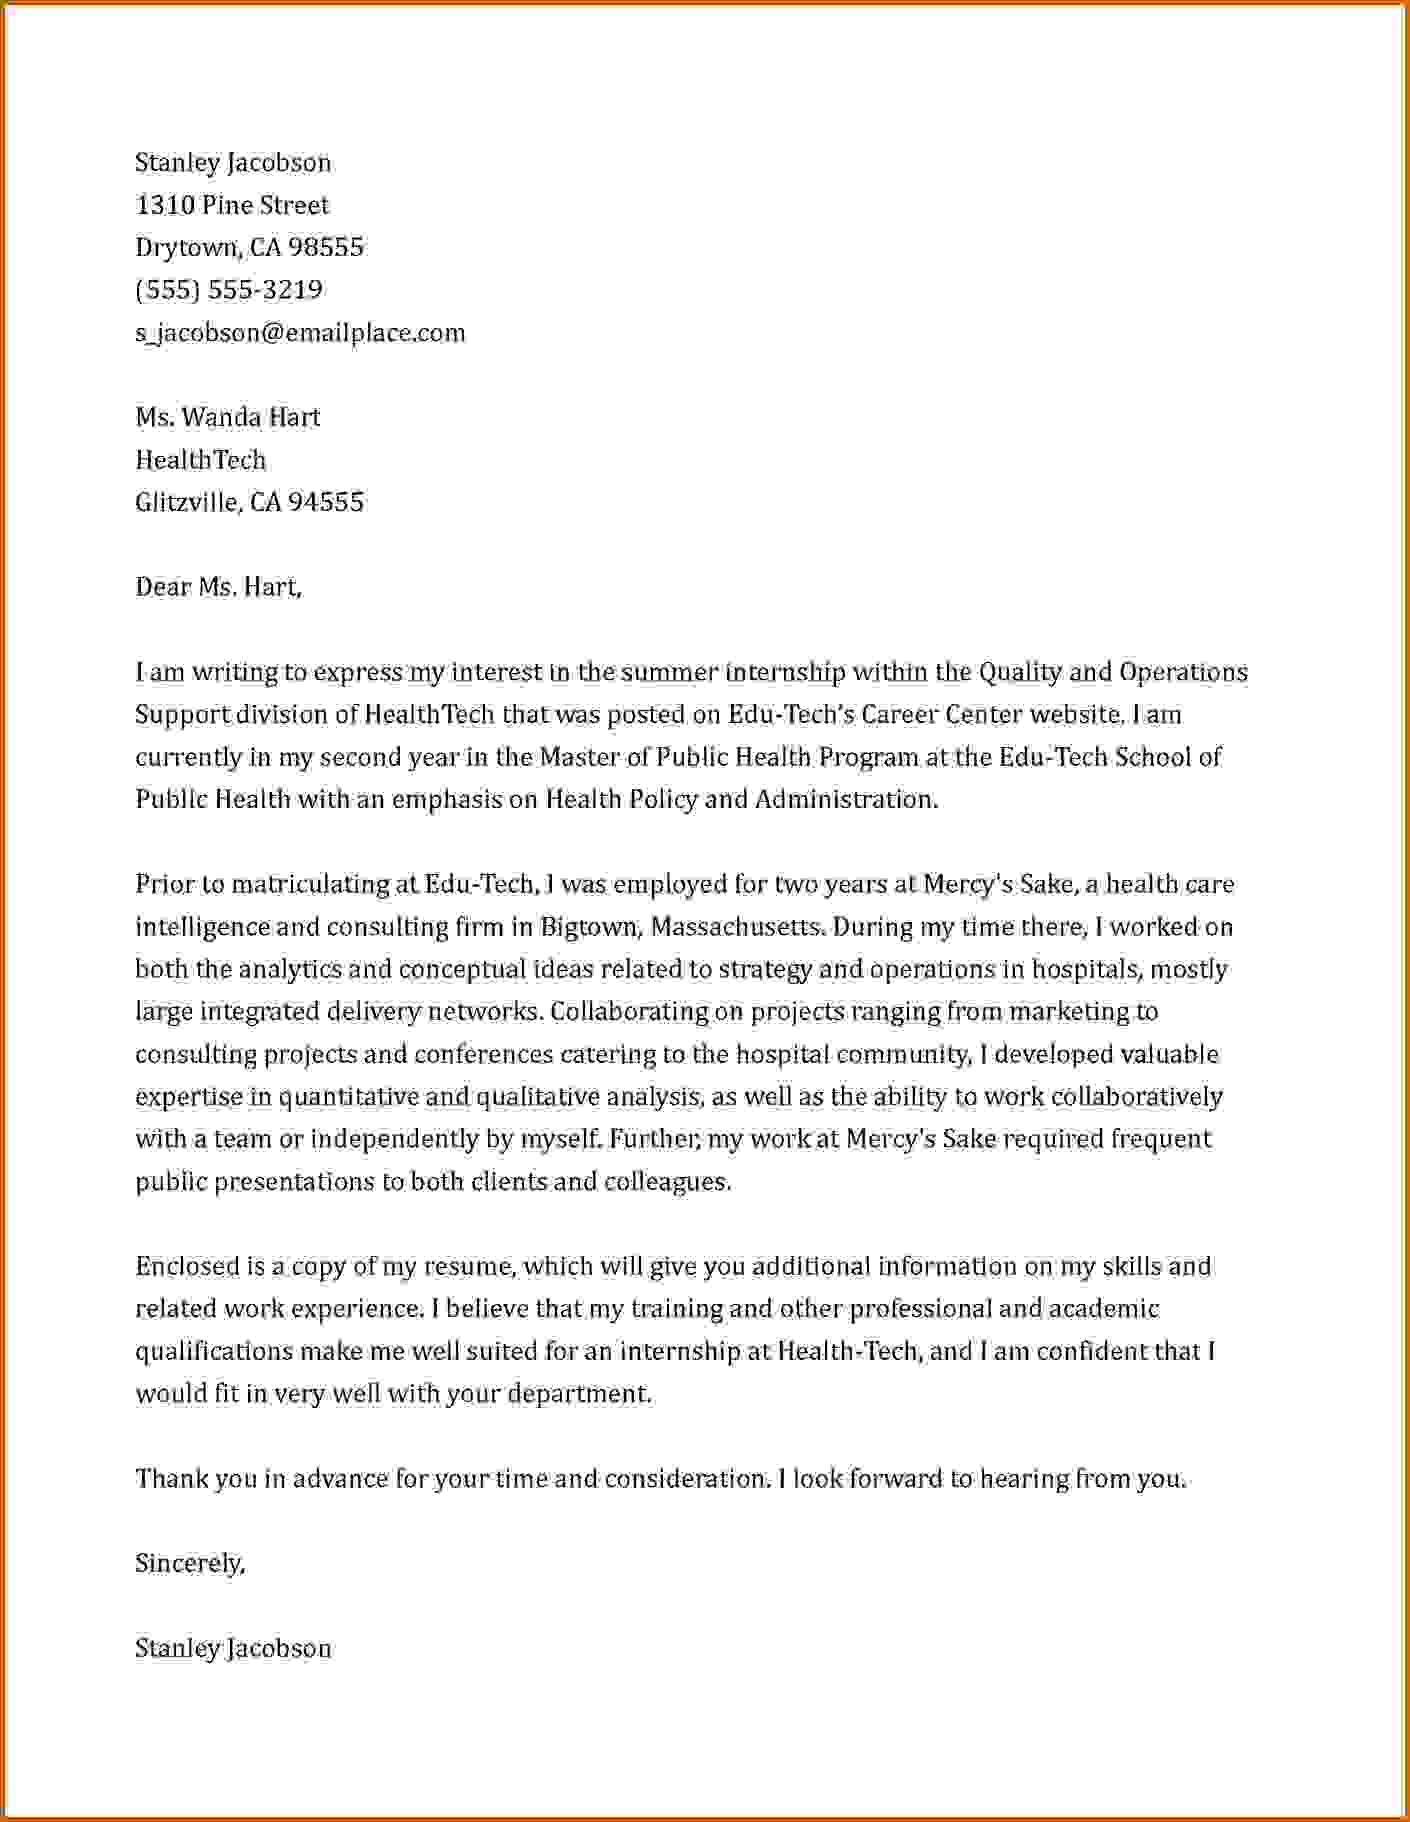 Cover Letter For Summer Internship New 8 Internship Cover Letter Sle Lease Template #studymathonine  Math .